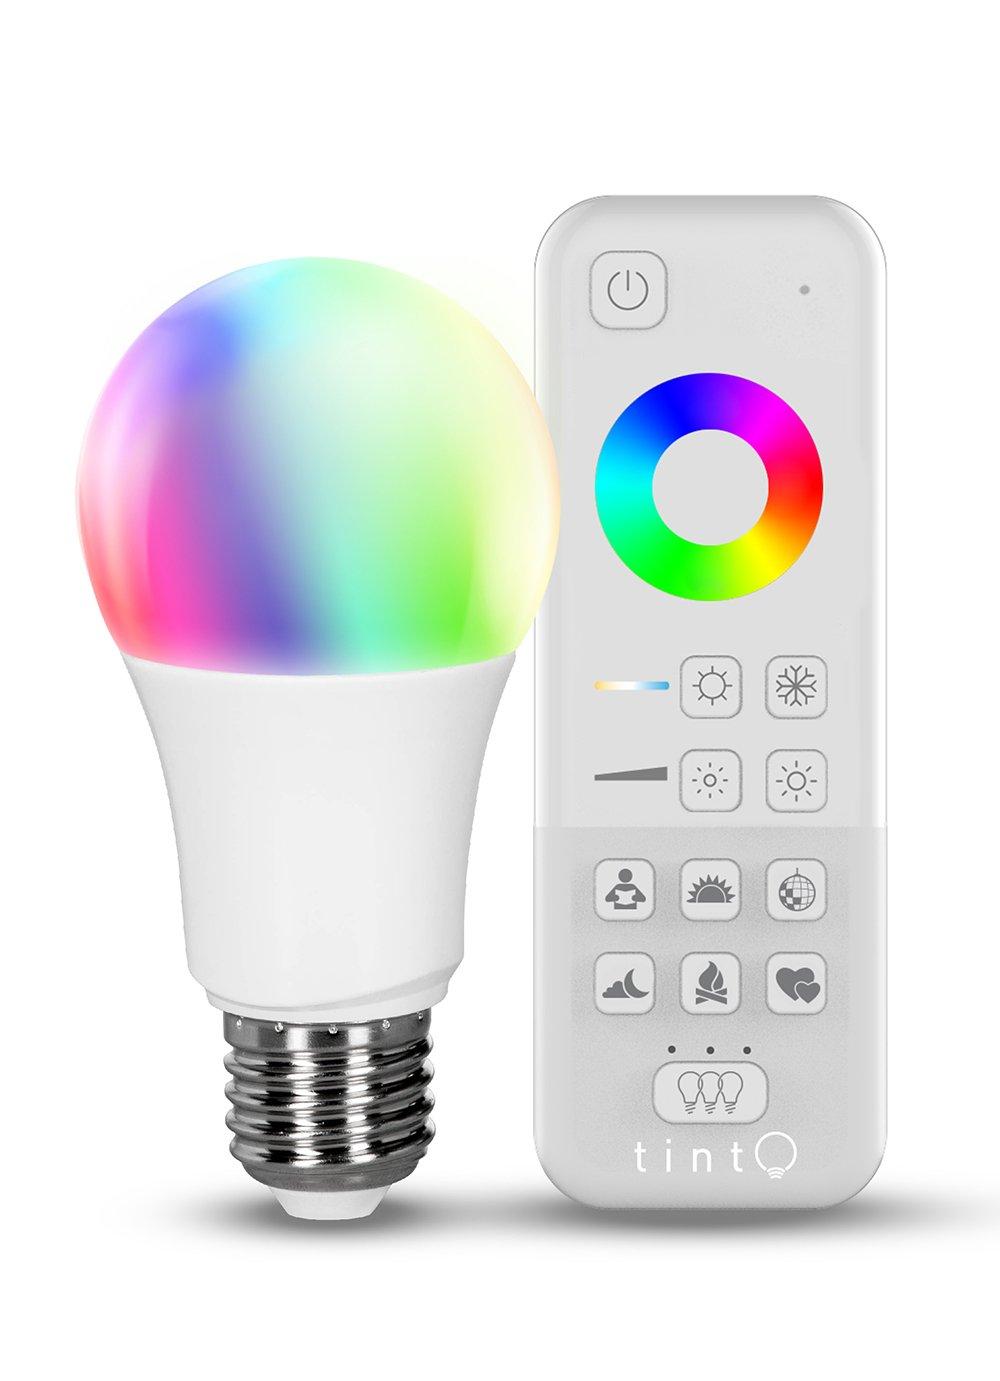 Smarte Beleuchtung Ab Heute Bei Aldi Das Angebot Im Check Handy De